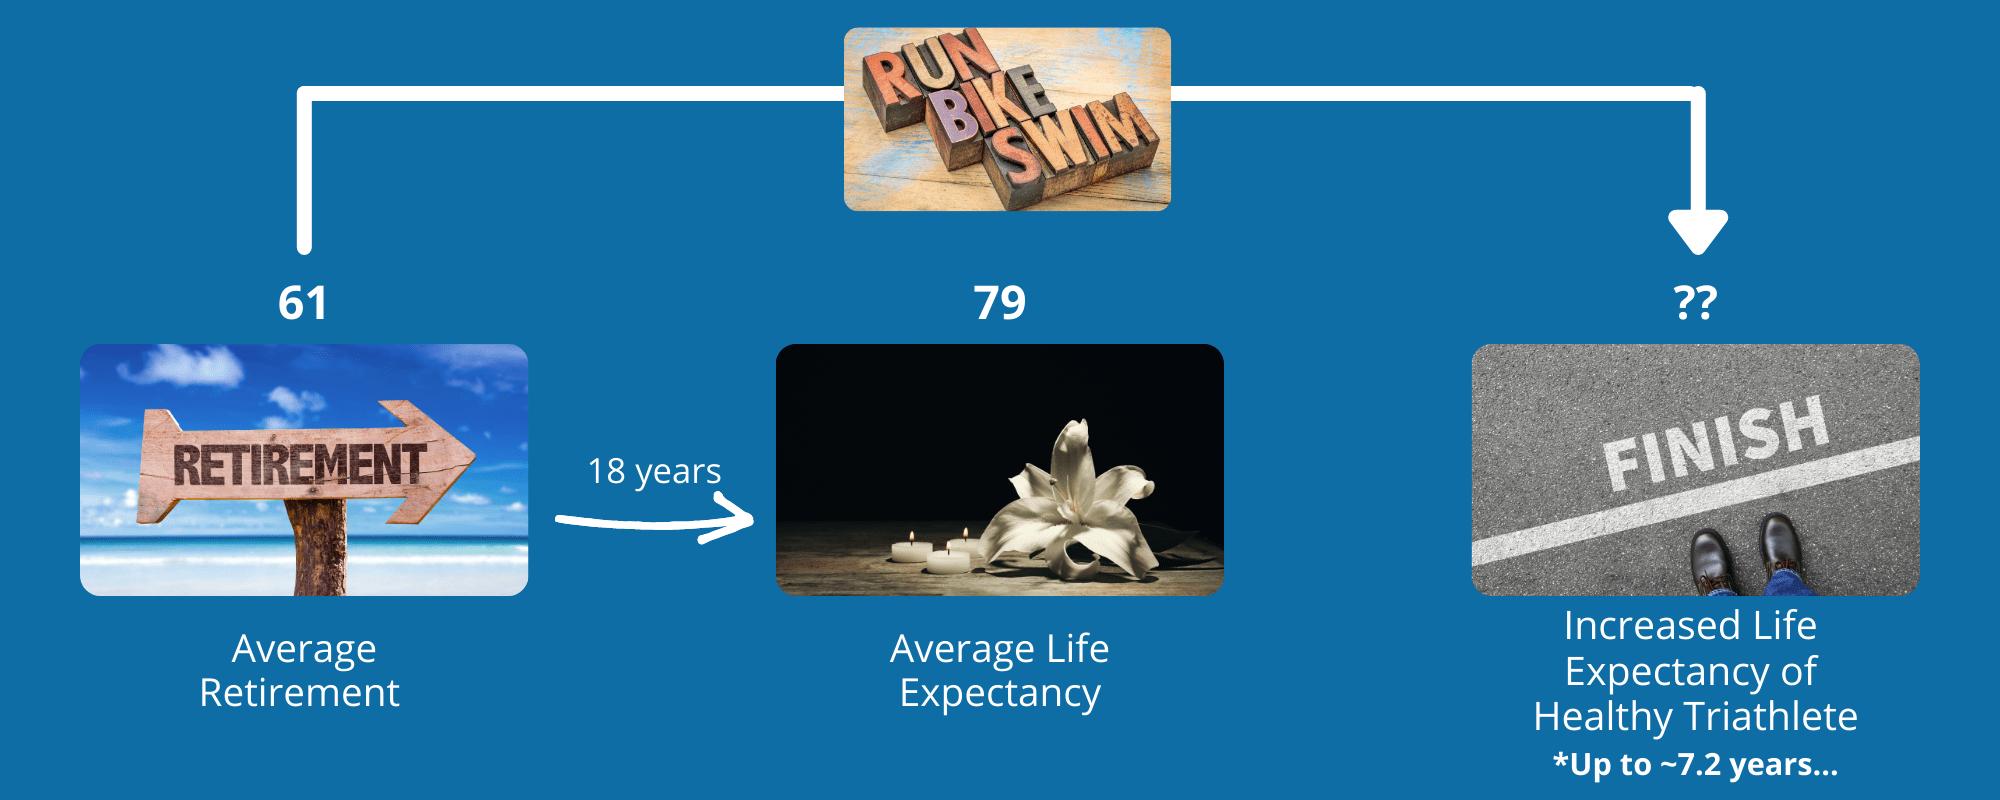 Image illustrating the increased anticipated longevity of a triathlete.